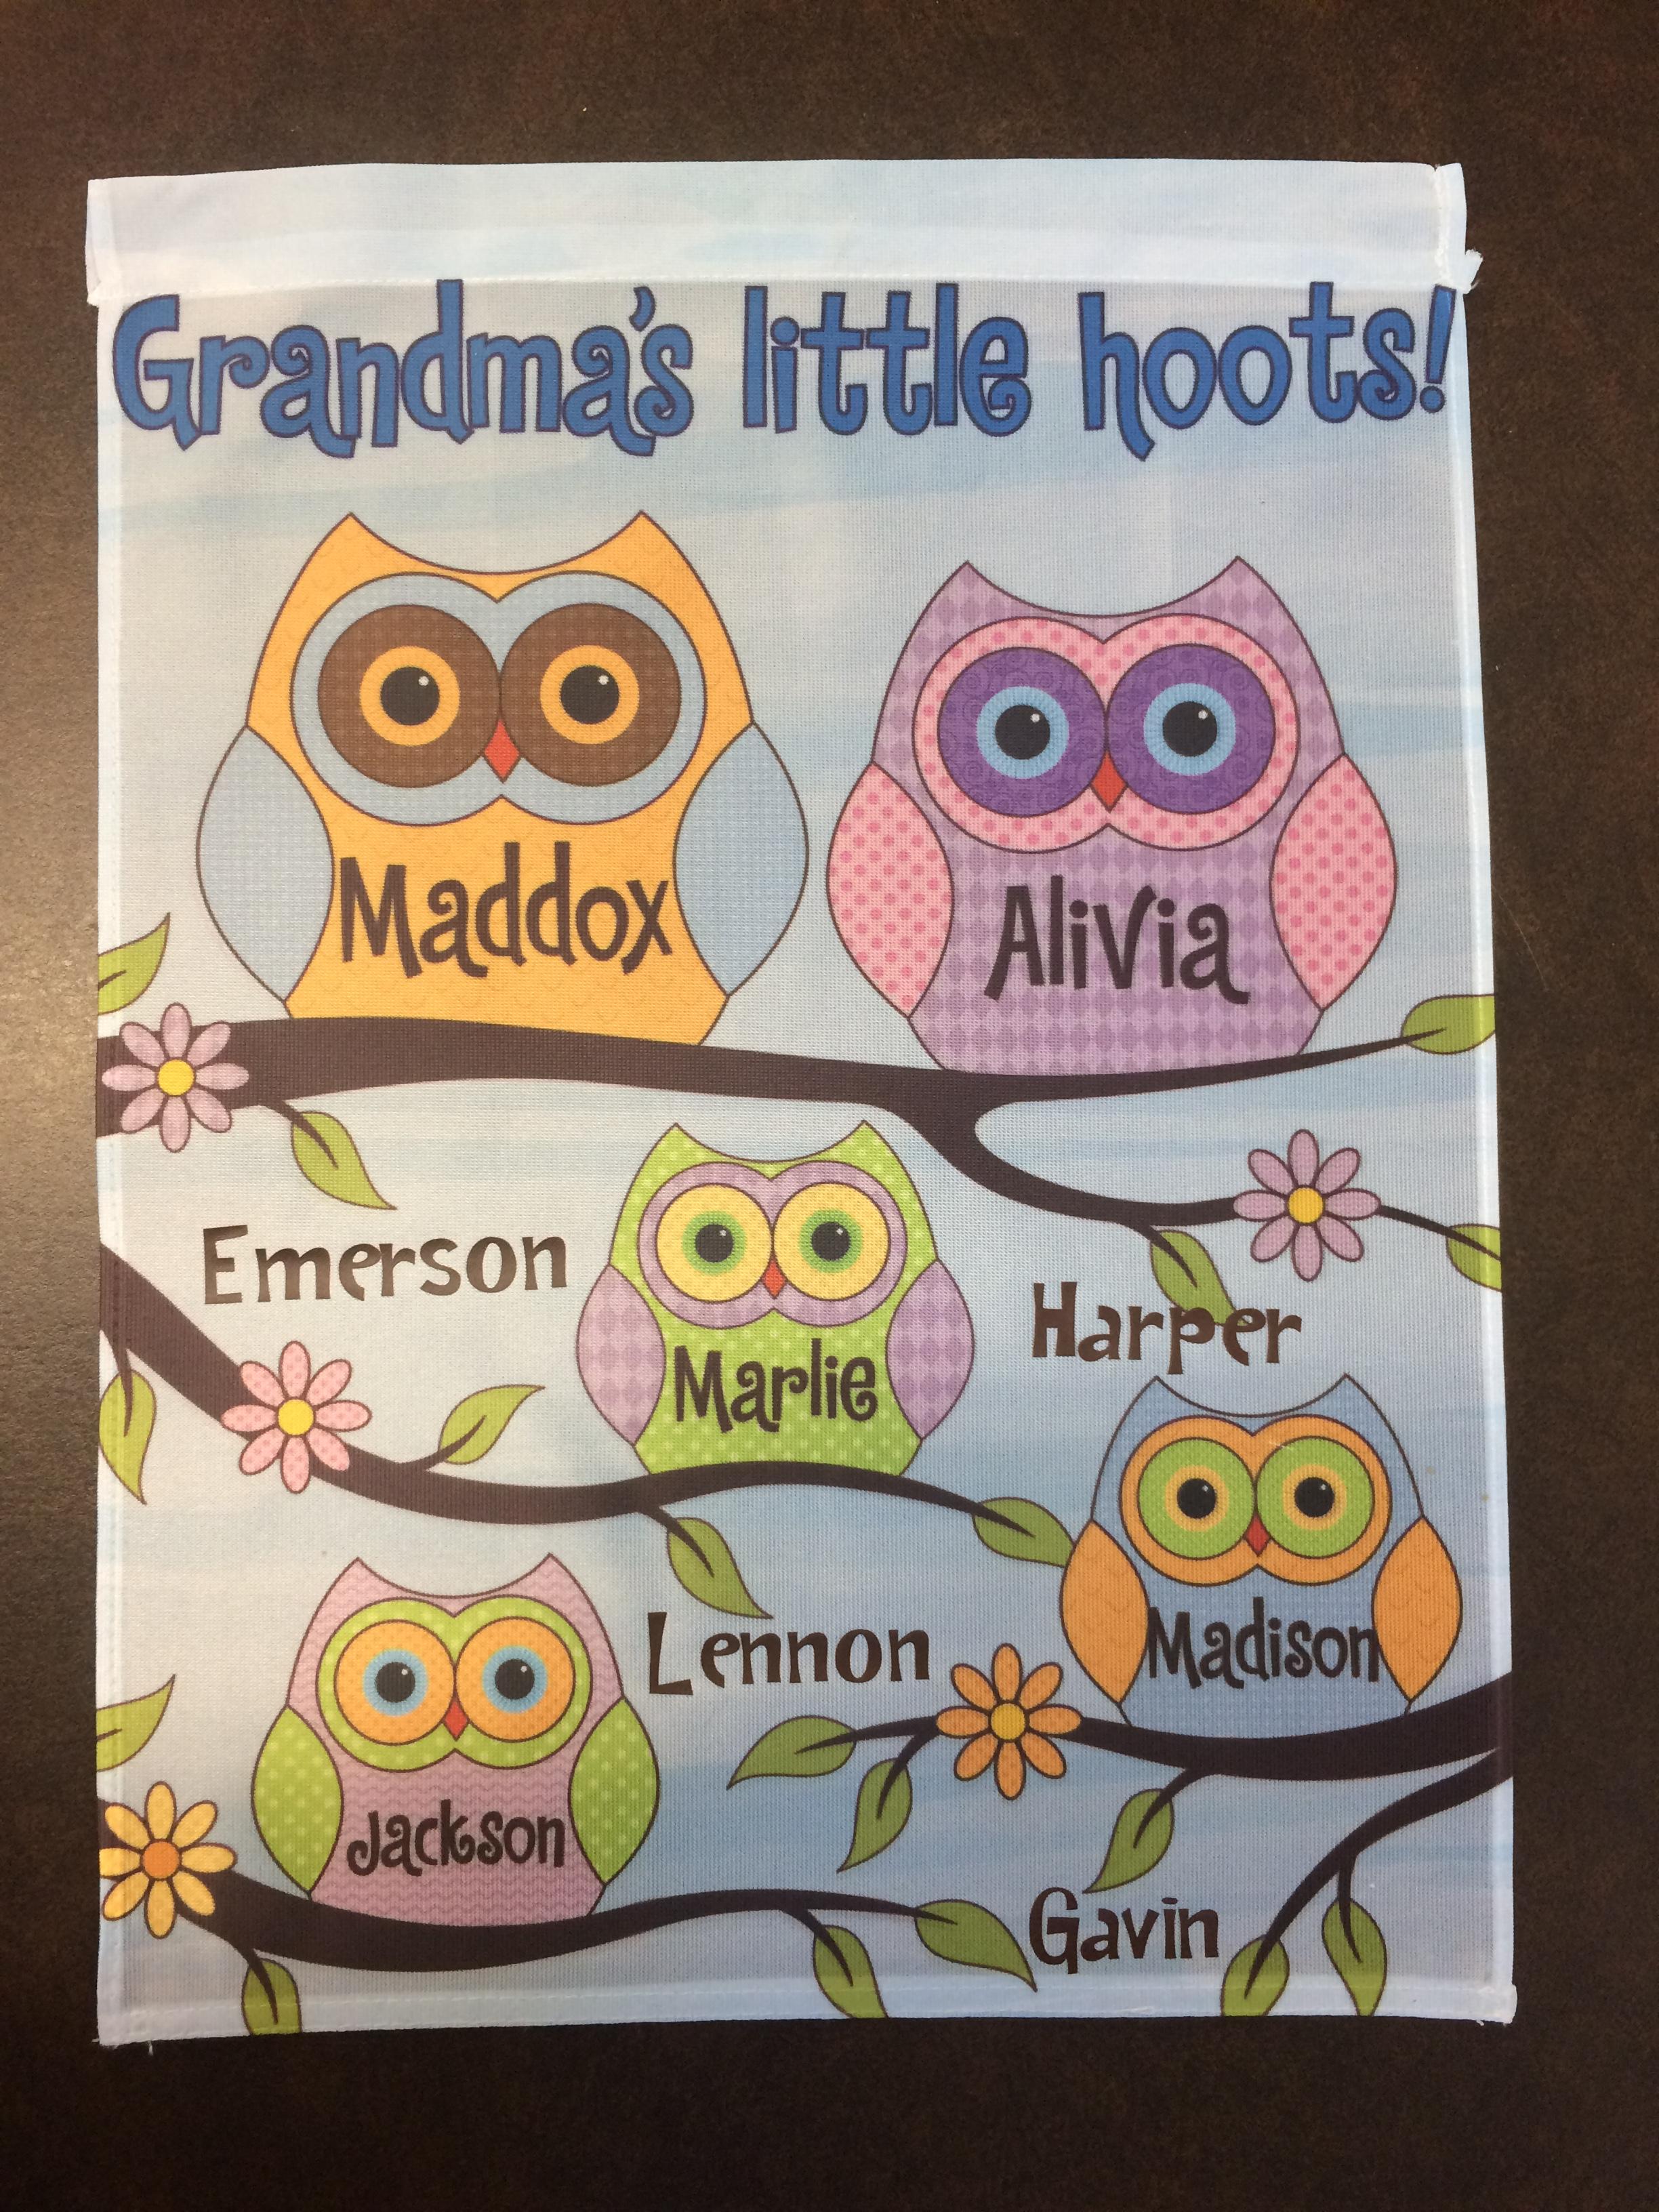 grandma-s-personalized-owls.jpg